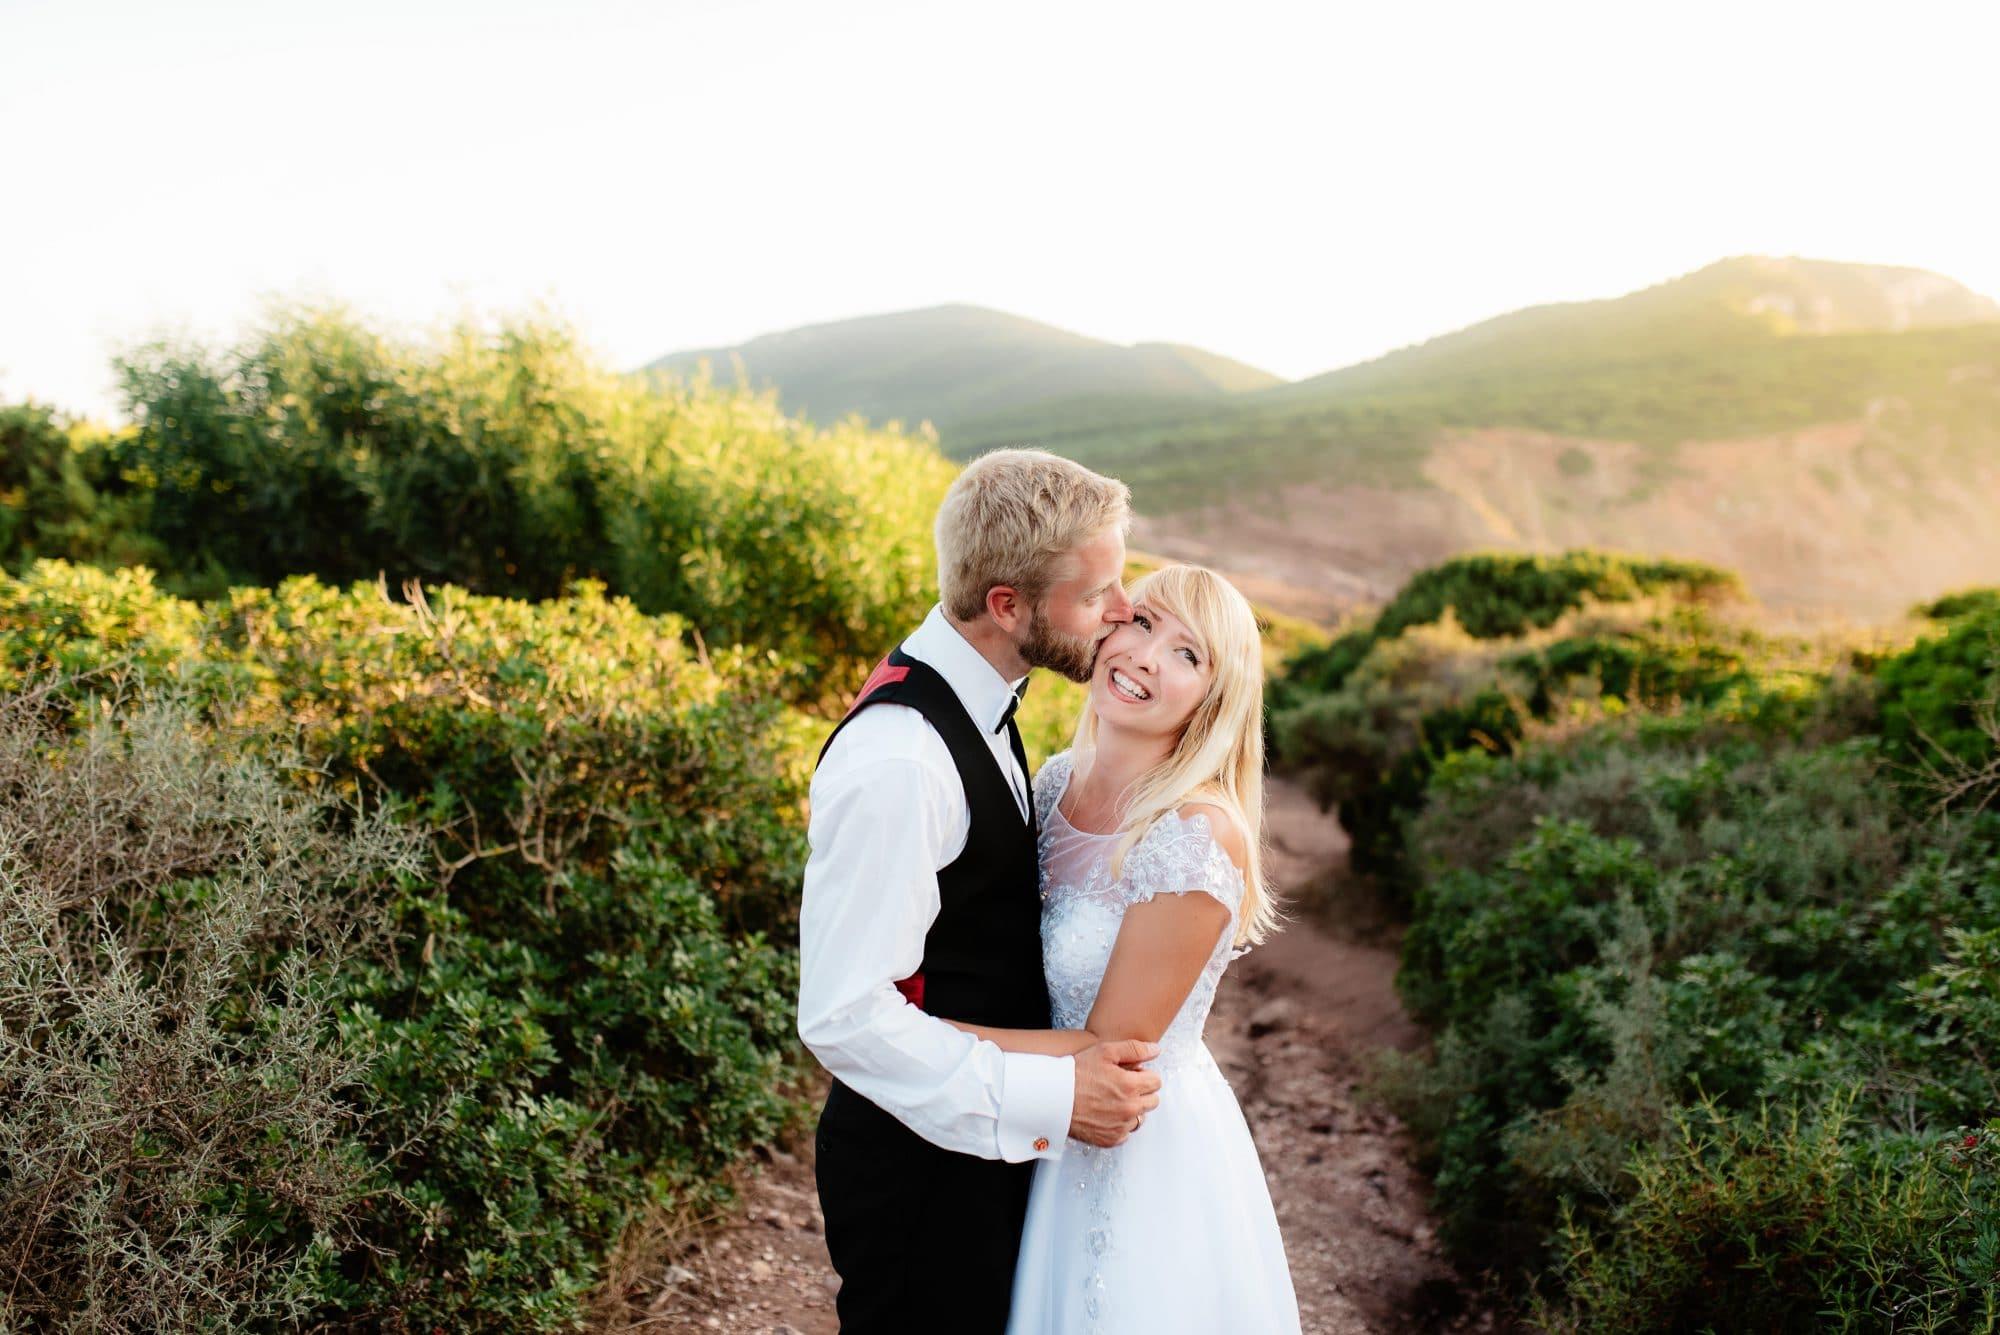 Honeymoon in Alghero, Sardinia.